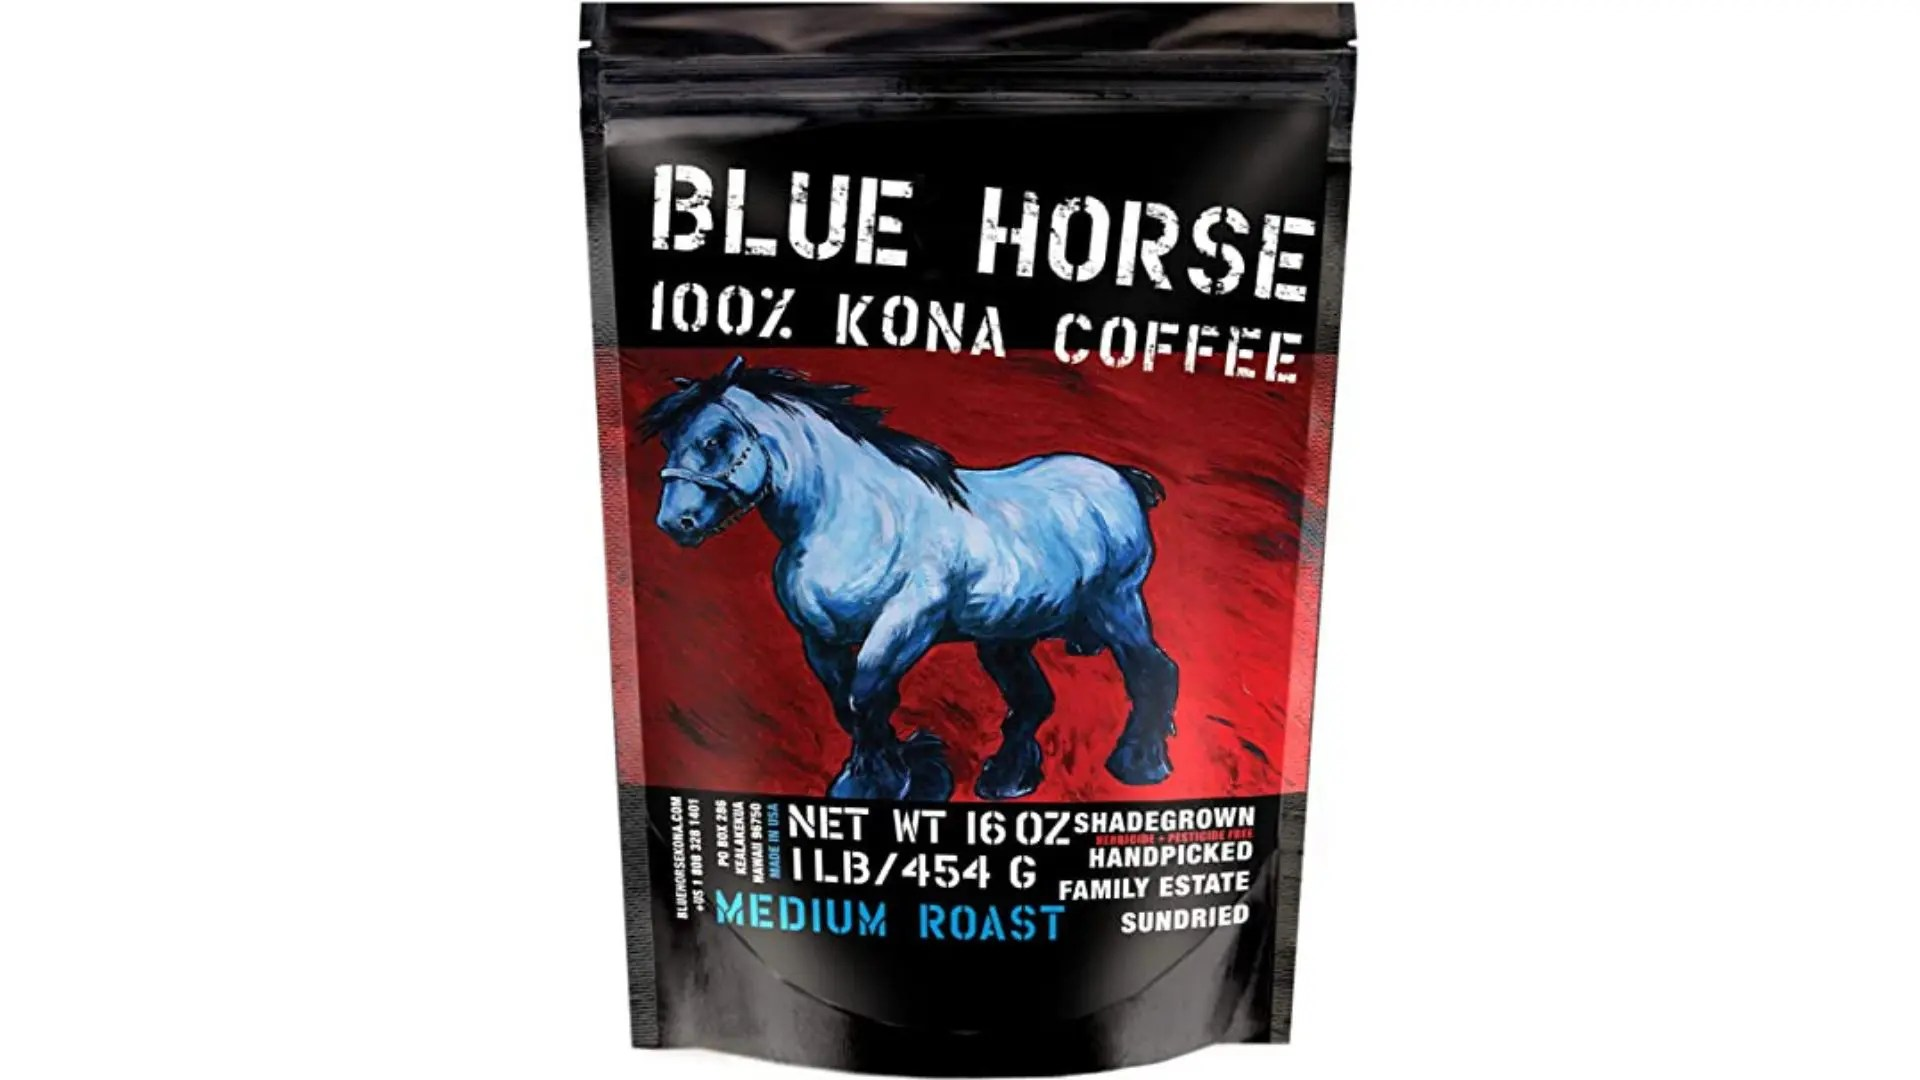 Blue Horse 100% Kona Coffee